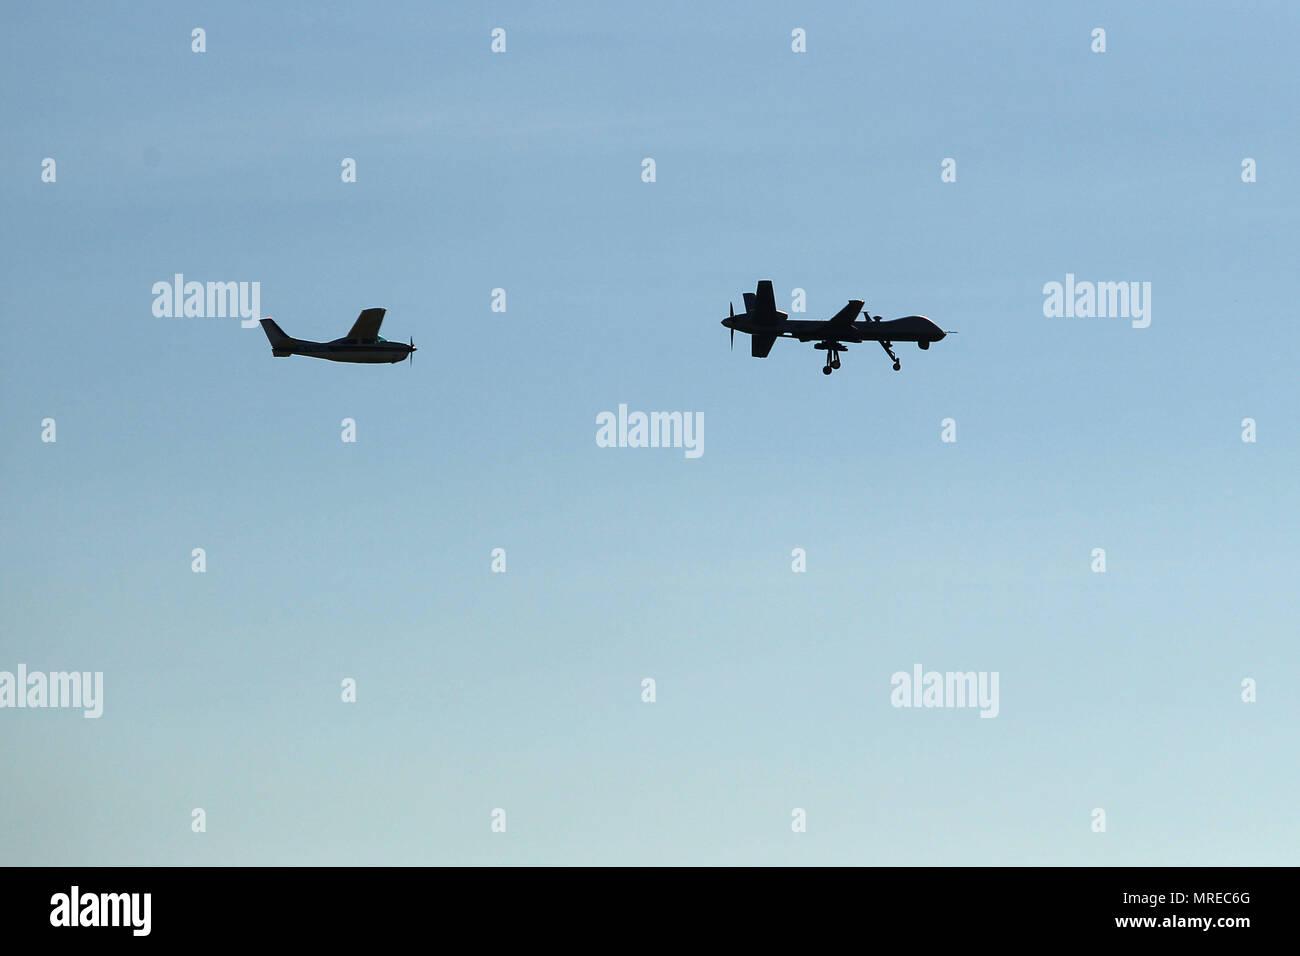 Chase Plane Stock Photos & Chase Plane Stock Images - Alamy